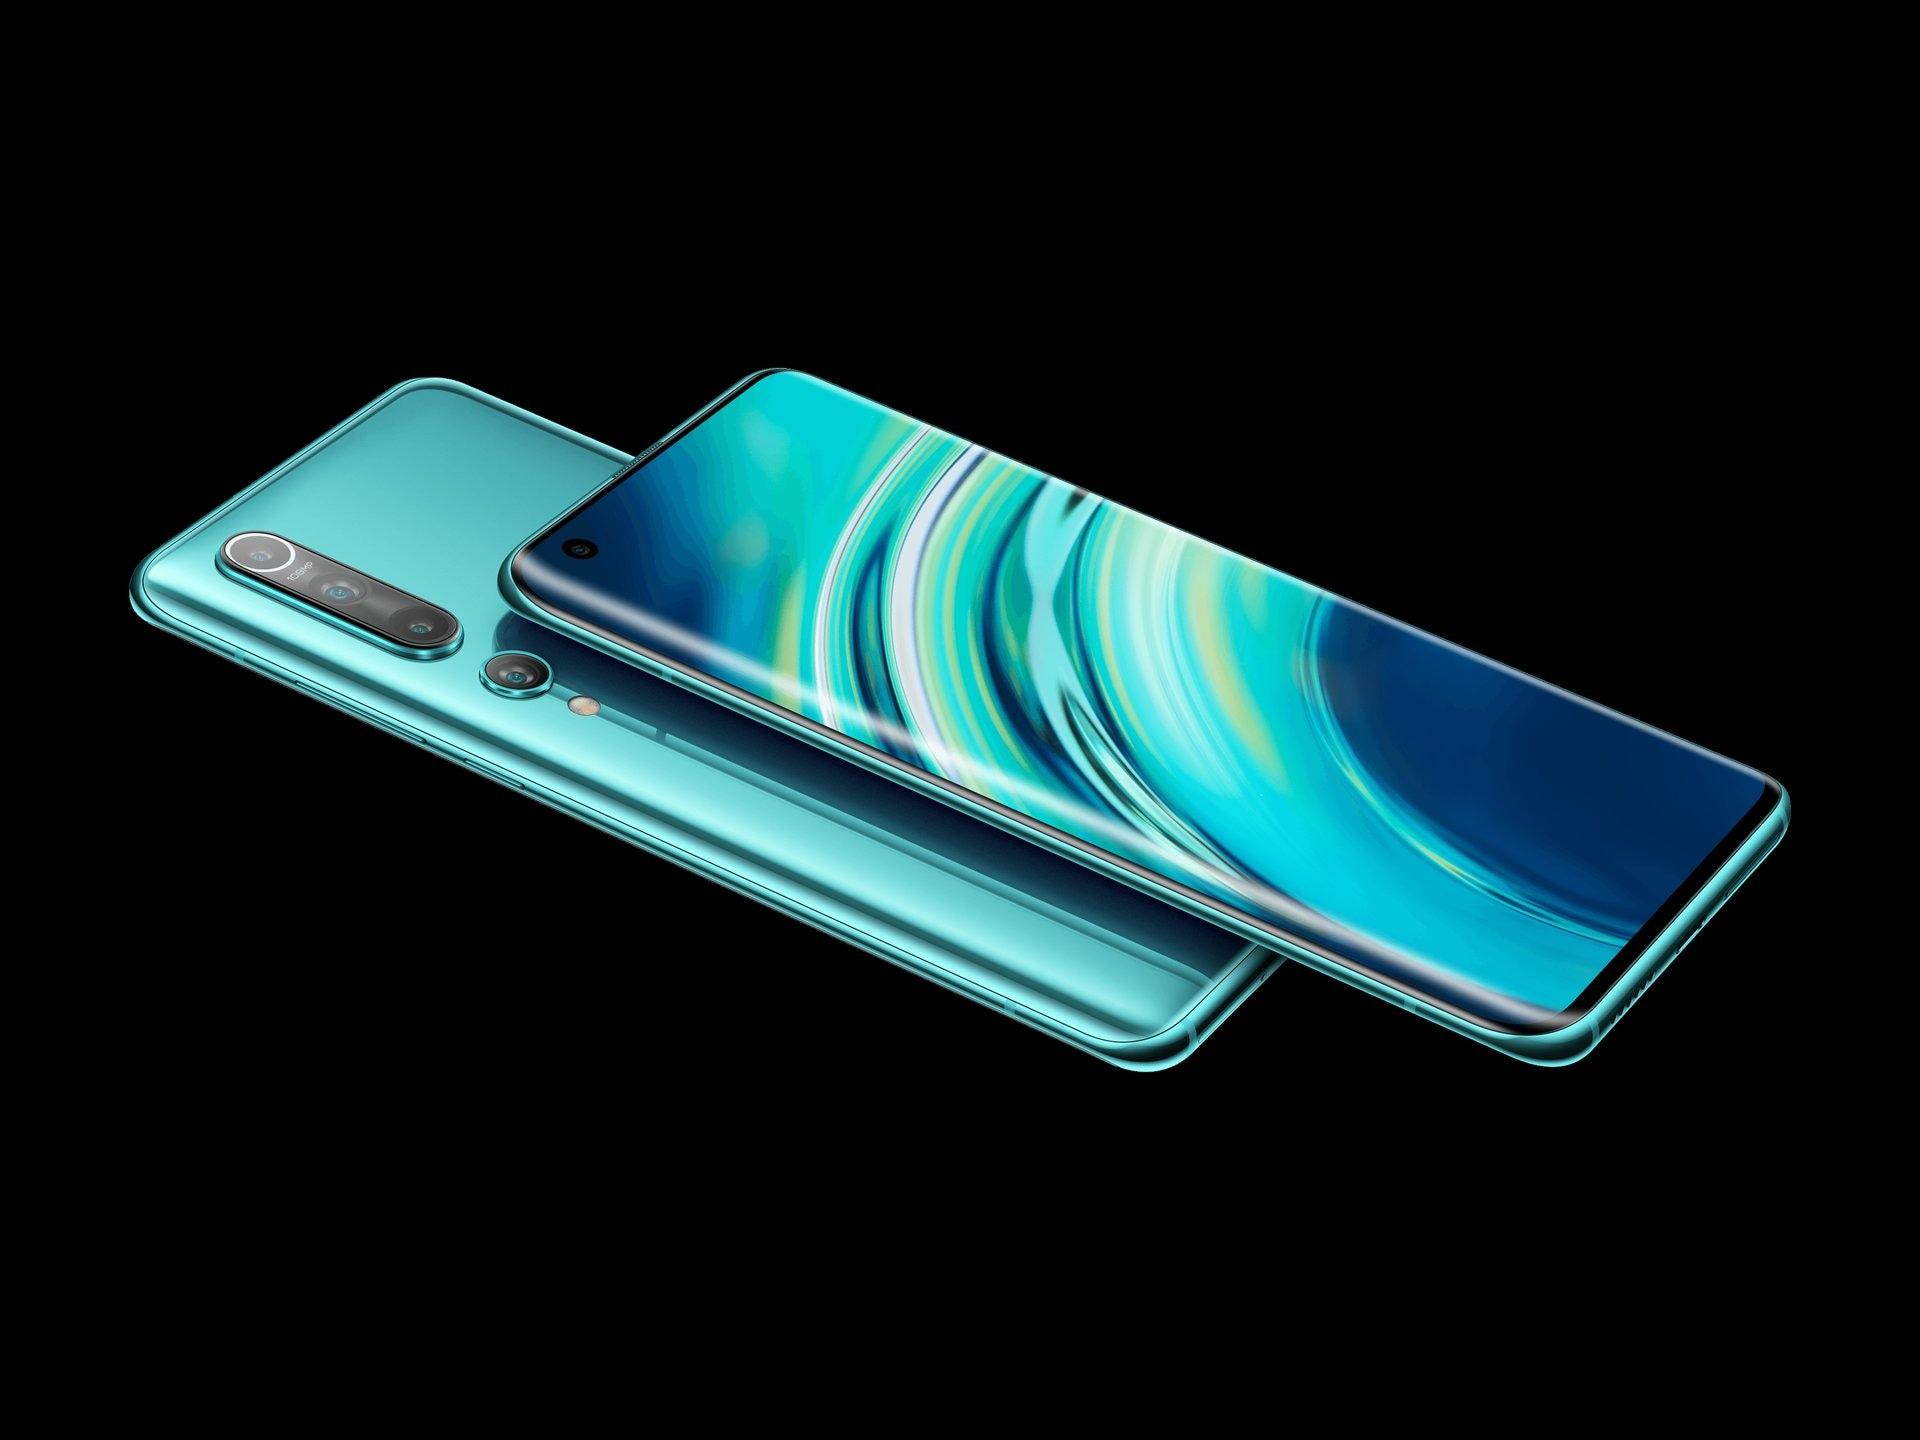 Offerta Amazon per Xiaomi Mi 10 in versione verde da 256 GB